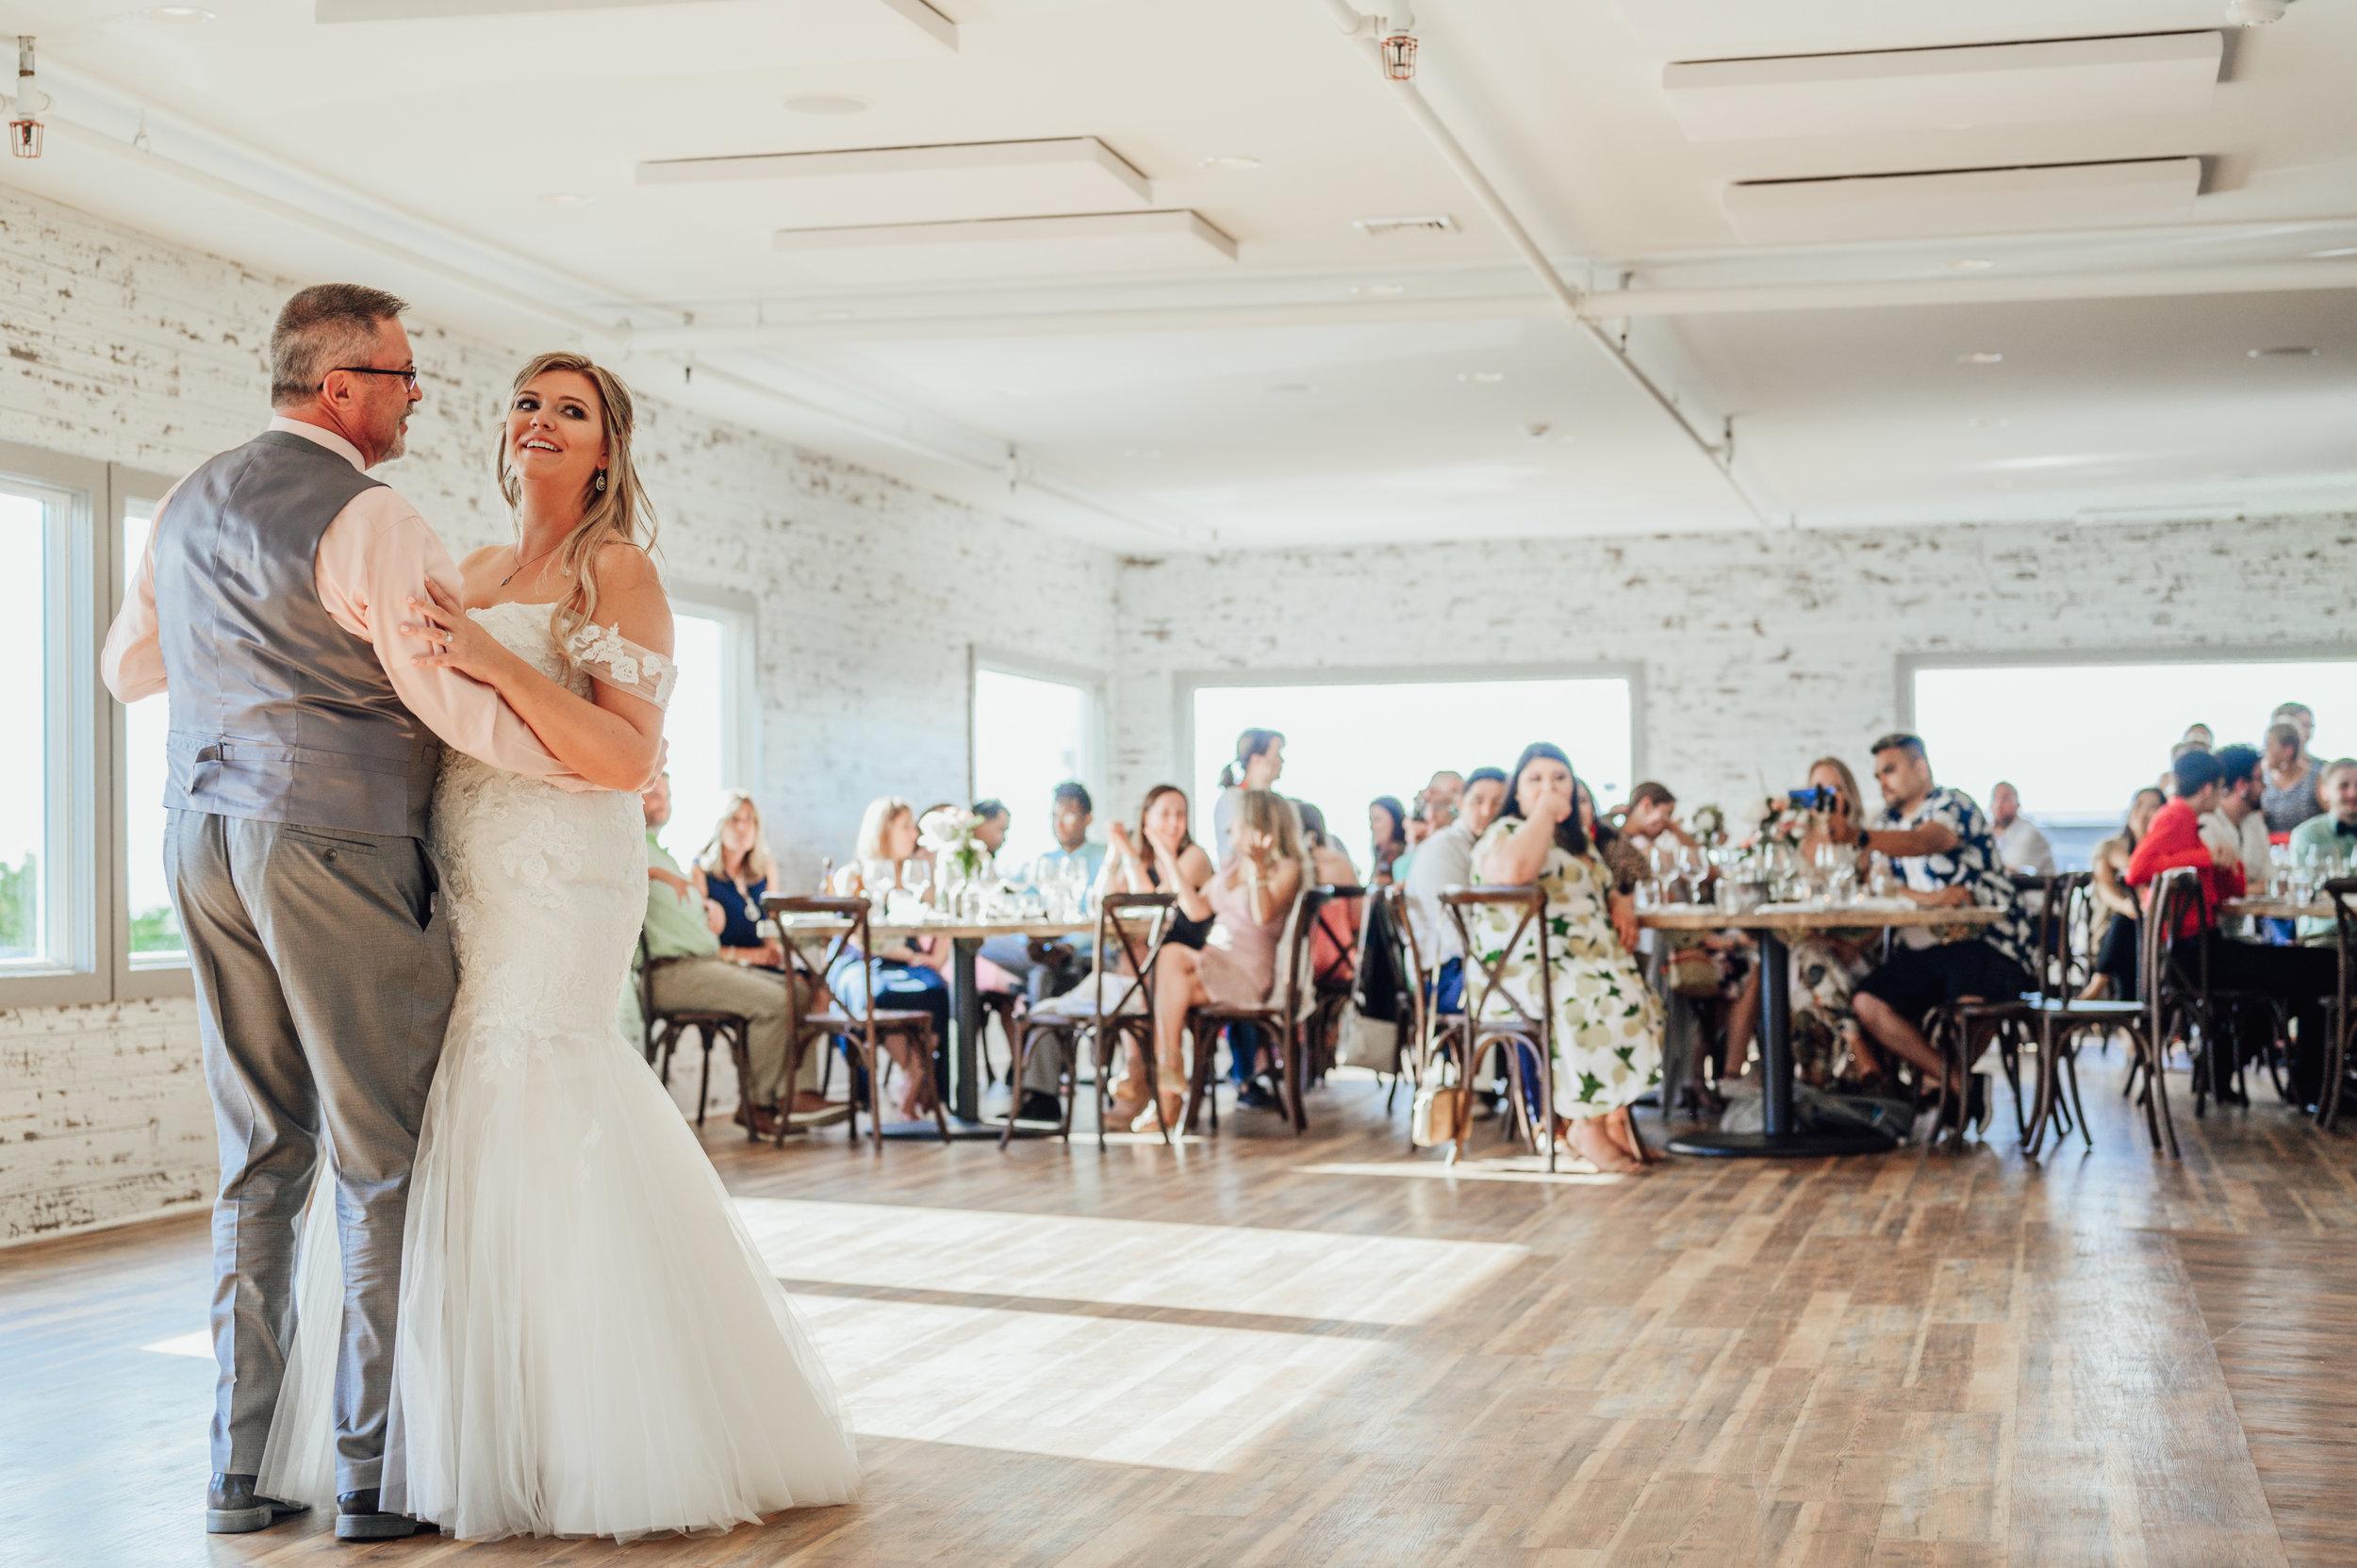 New Jersey Wedding Photographer, Felsberg Photography LBI wedding photography 98.jpg